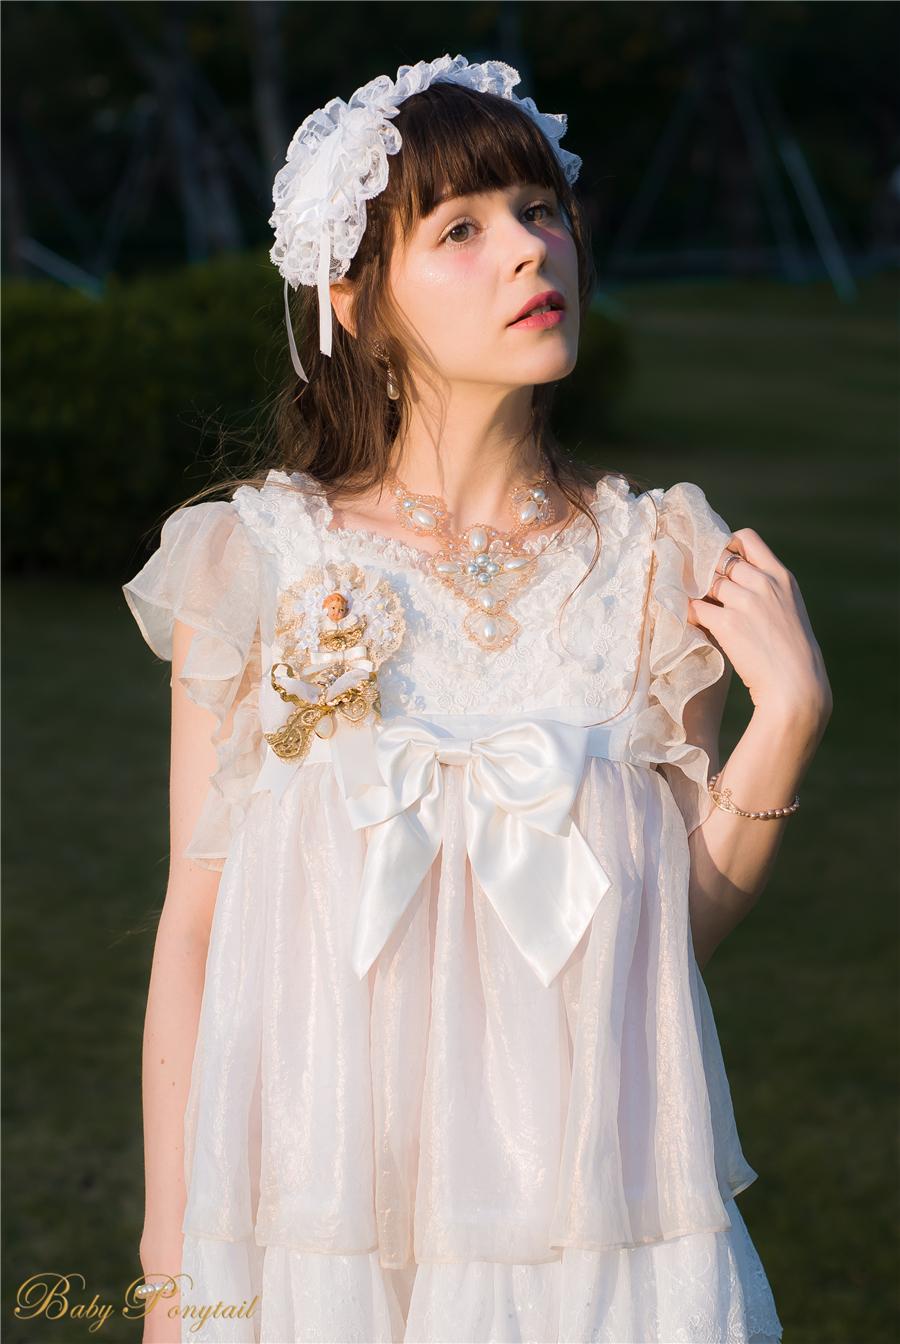 BabyPonytail_modelclaudia_Present Angel White JSK park11.jpg